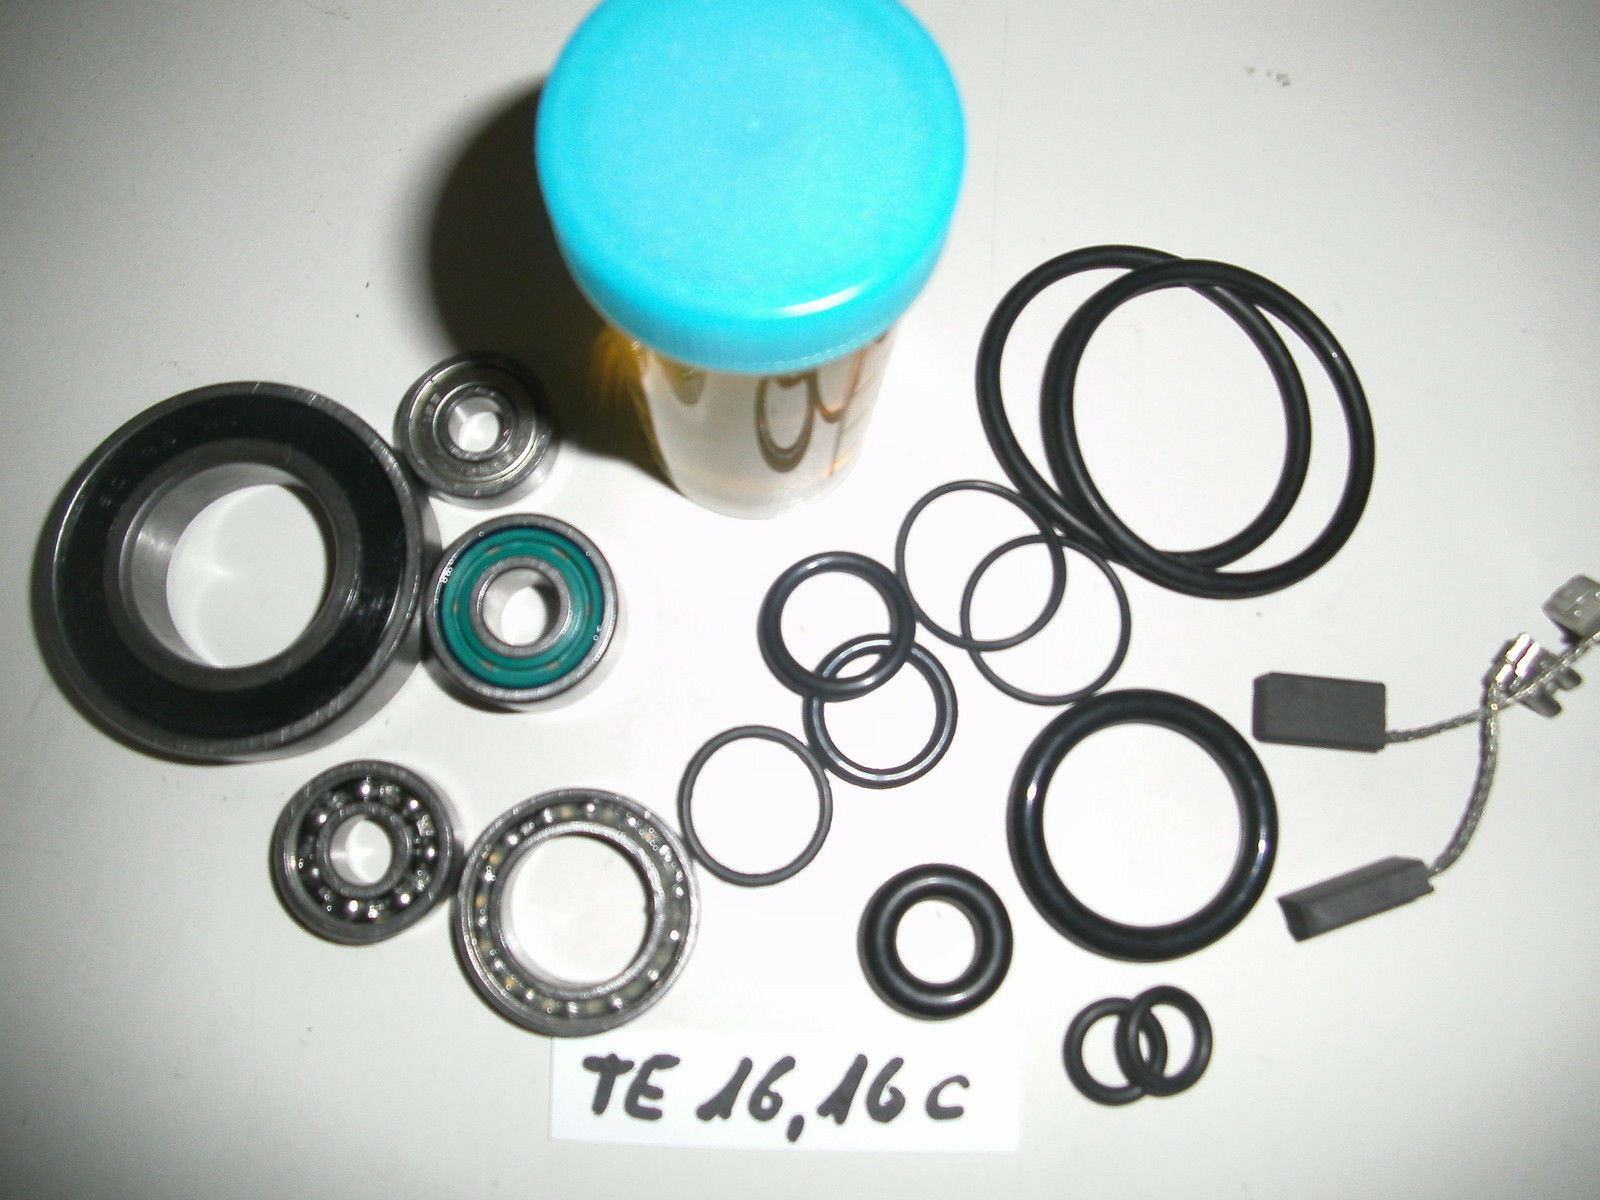 16 - Hilti TE 16 & TE 16 C, Reparatursatz, Verschleissteilesatz, Wartungset